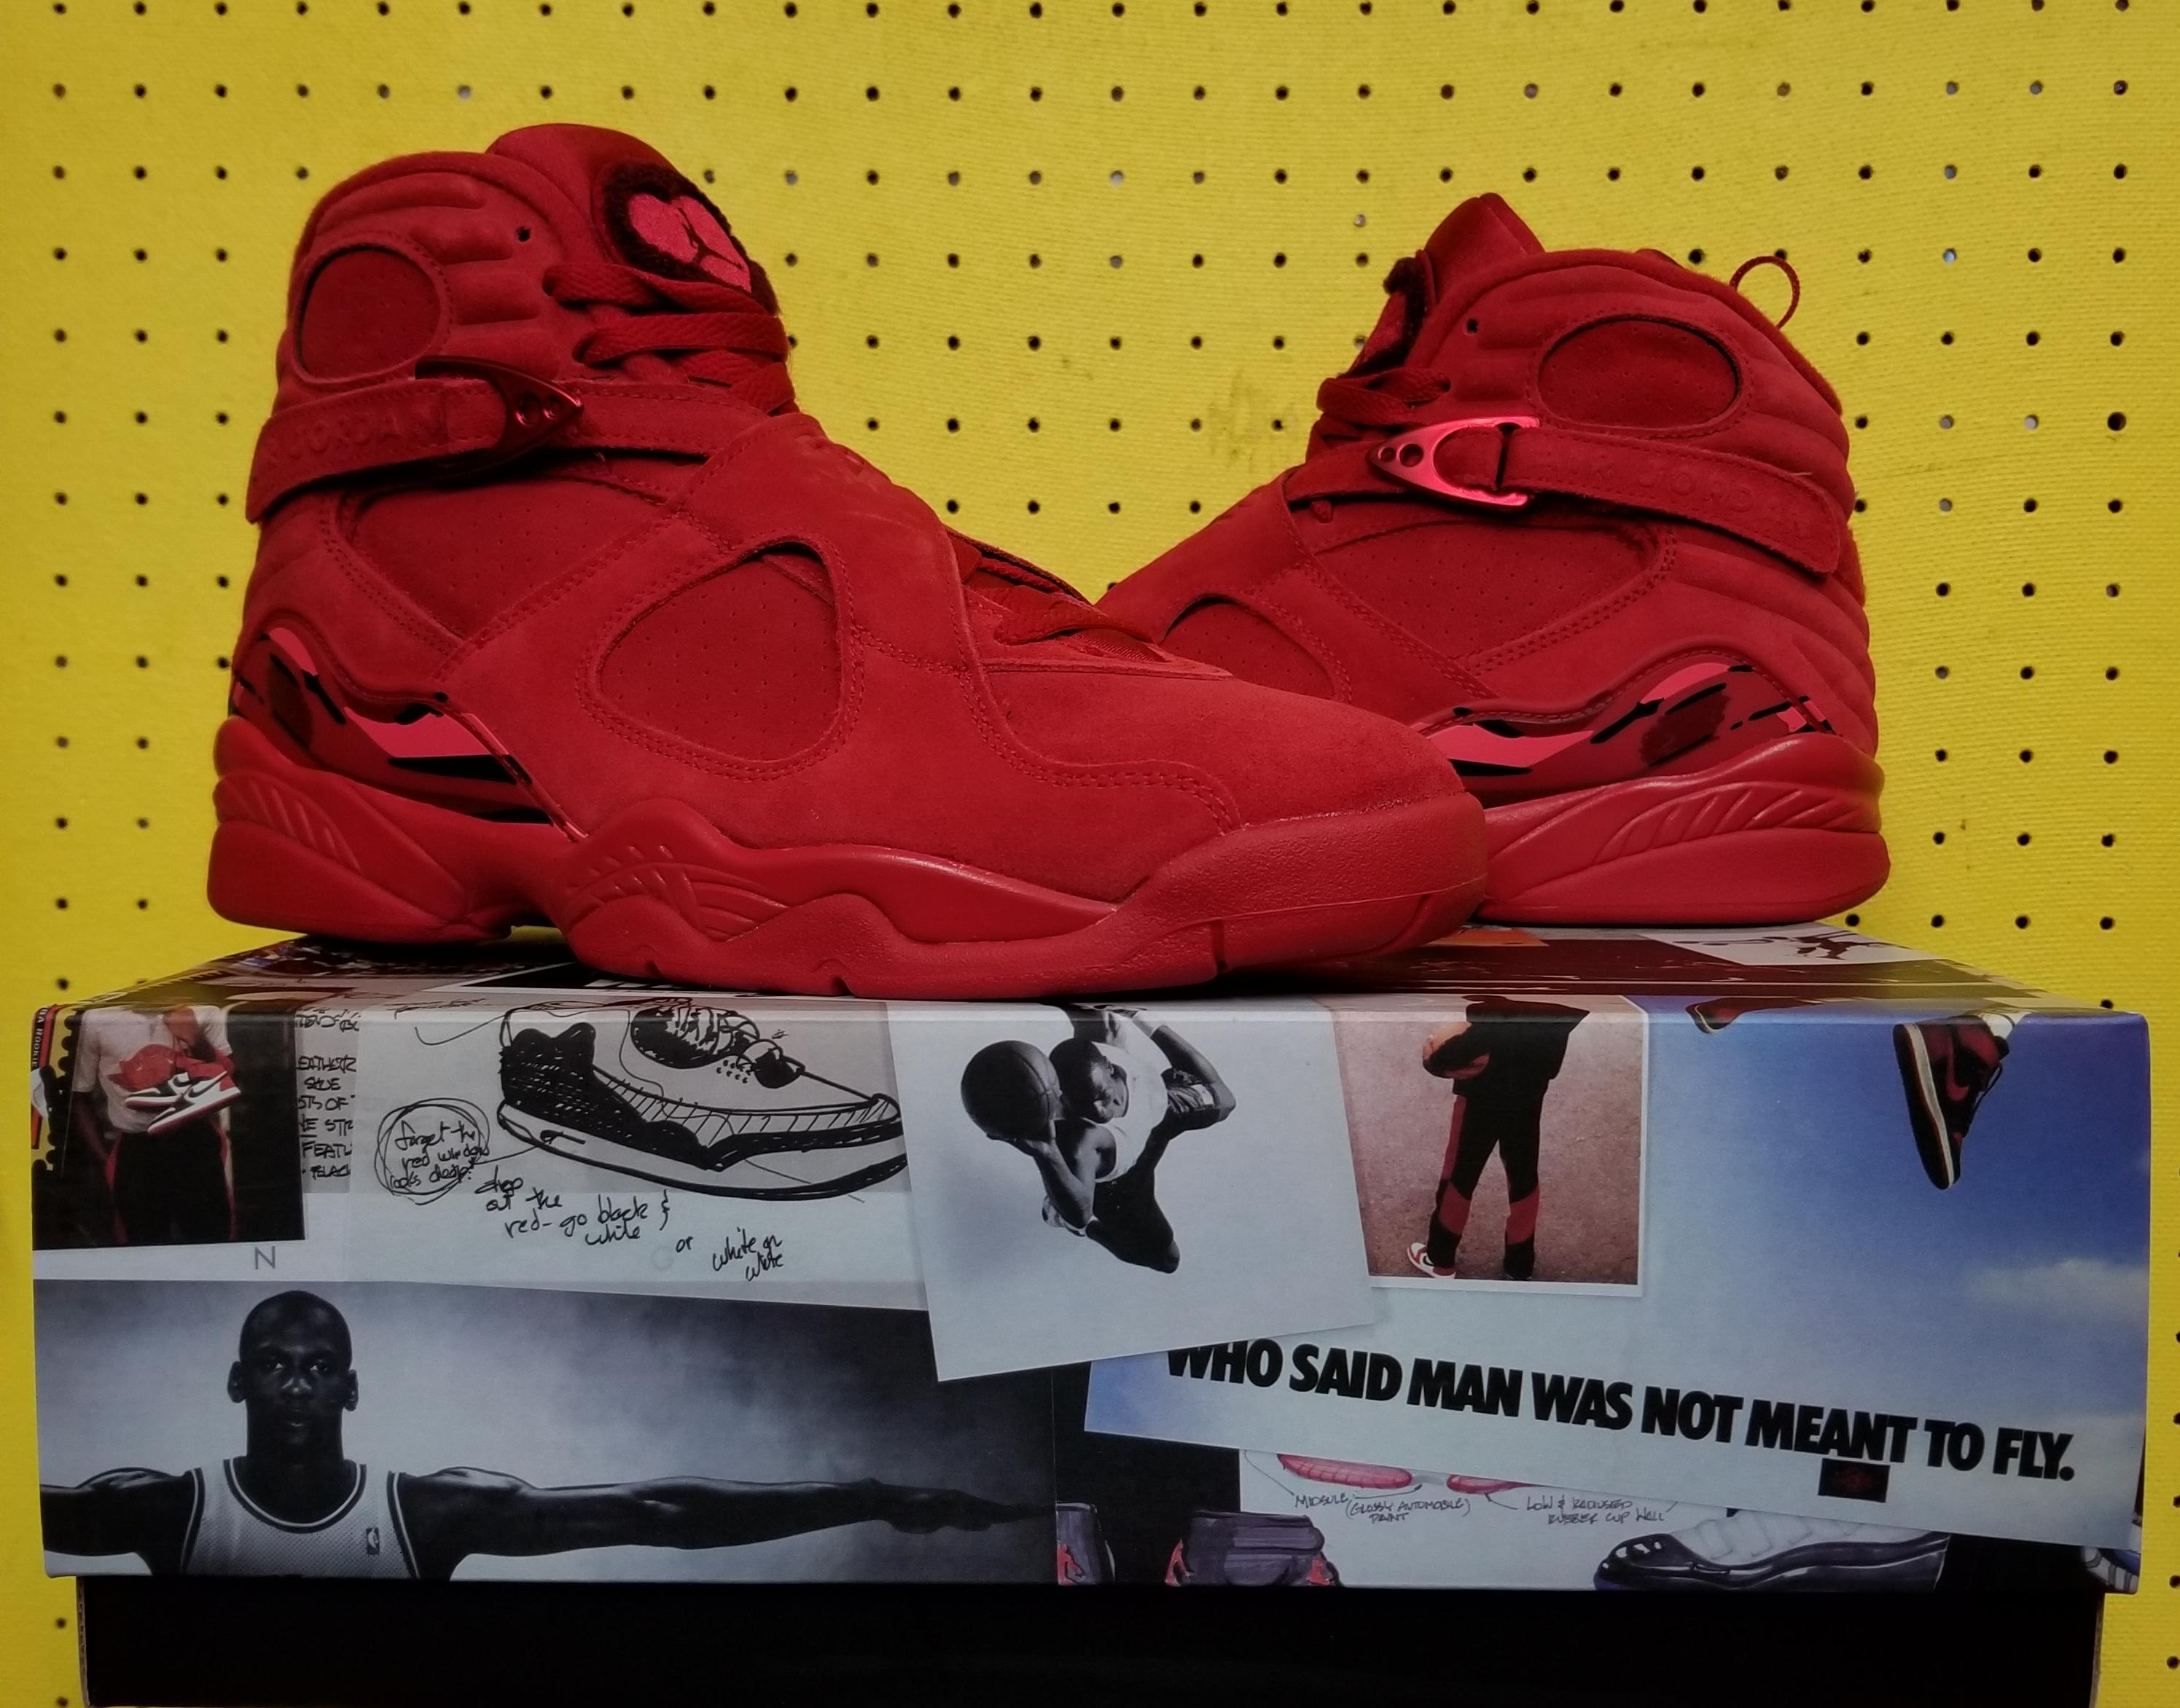 470b866d629c Nike Brand New Women s Air Jordan 8 Viii Retro Sz 10.0 Valentine s Day Gym Red  Aq2449 614